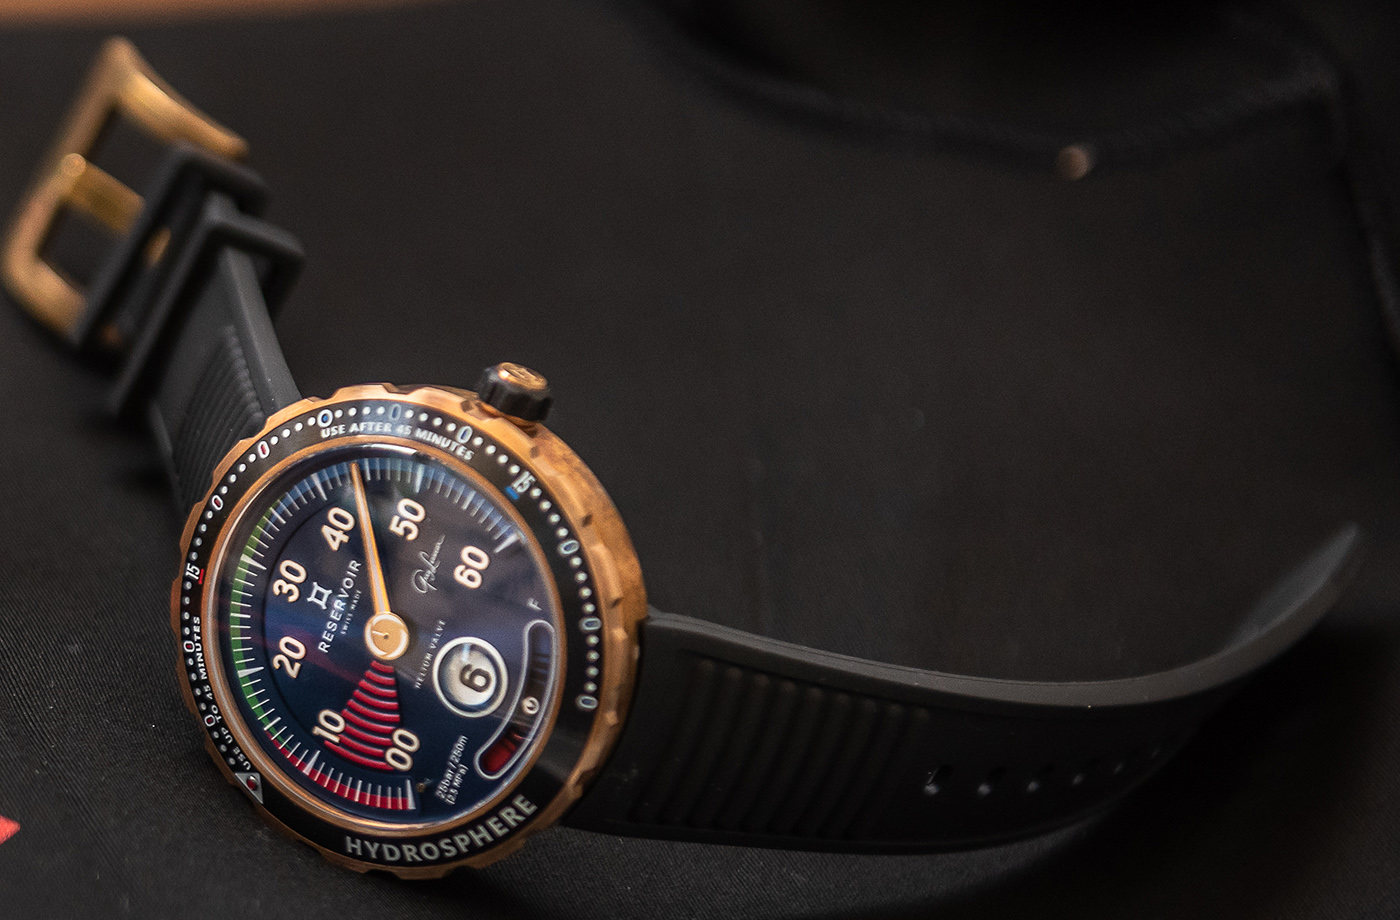 Reservoir представляет лимитированные часы Hydrosphere - Greg Lecoeur Edition Watch